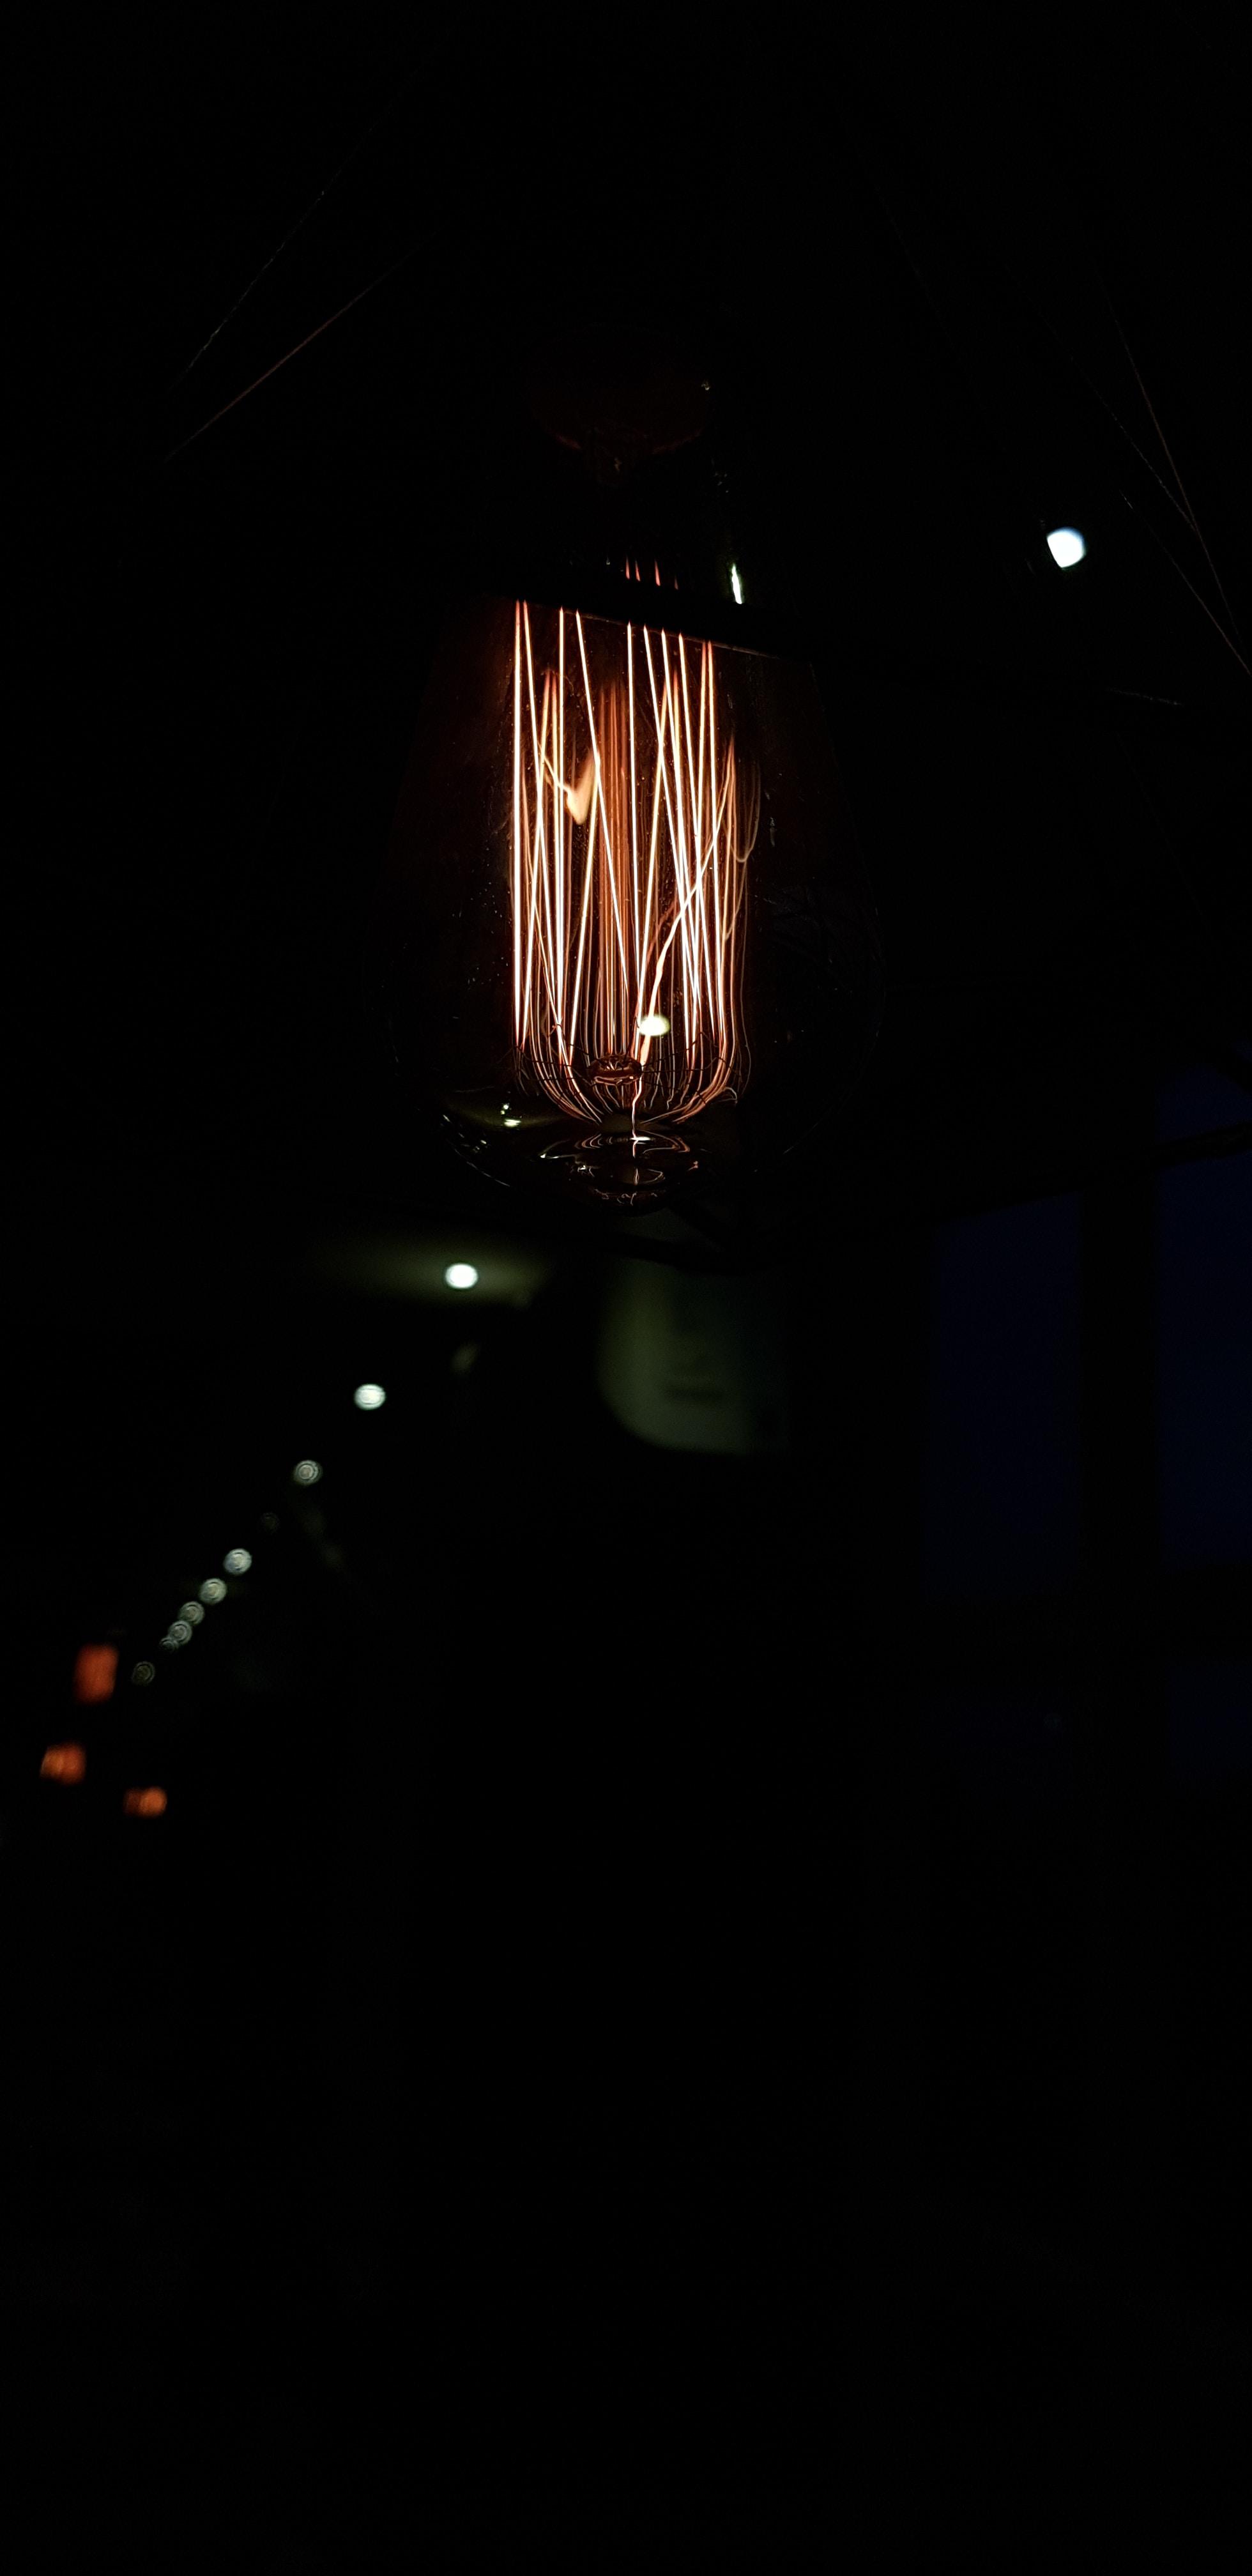 closeup photo of bulb light